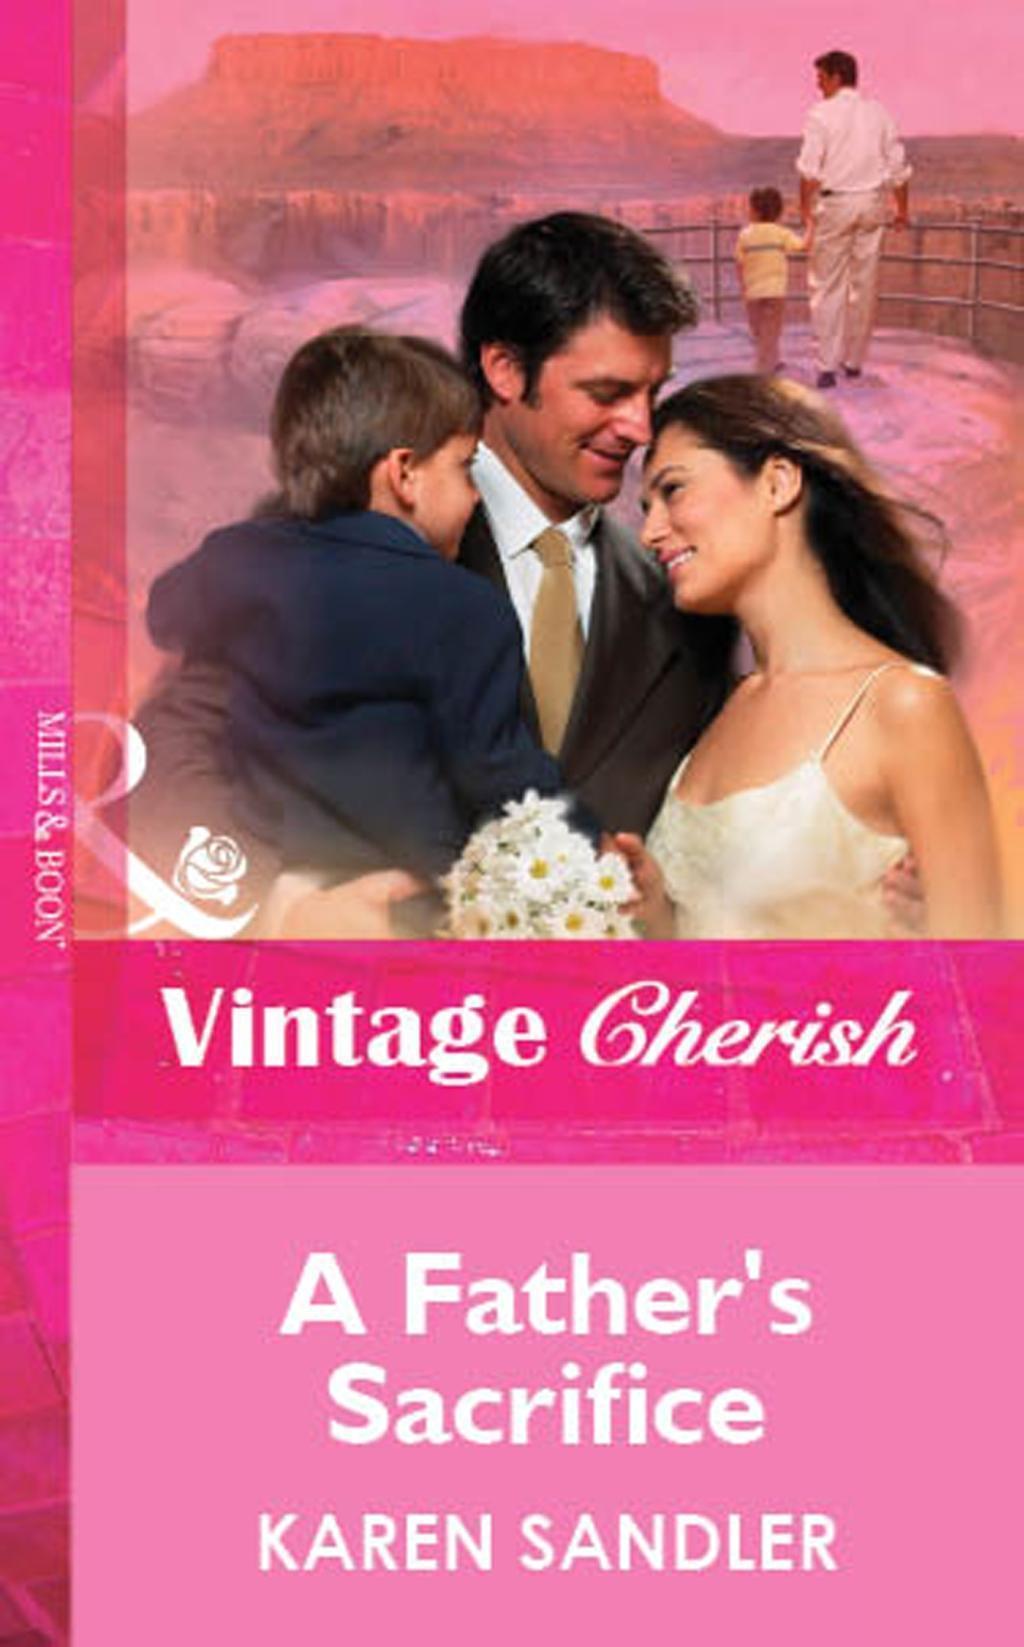 A Father's Sacrifice (Mills & Boon Vintage Cherish)